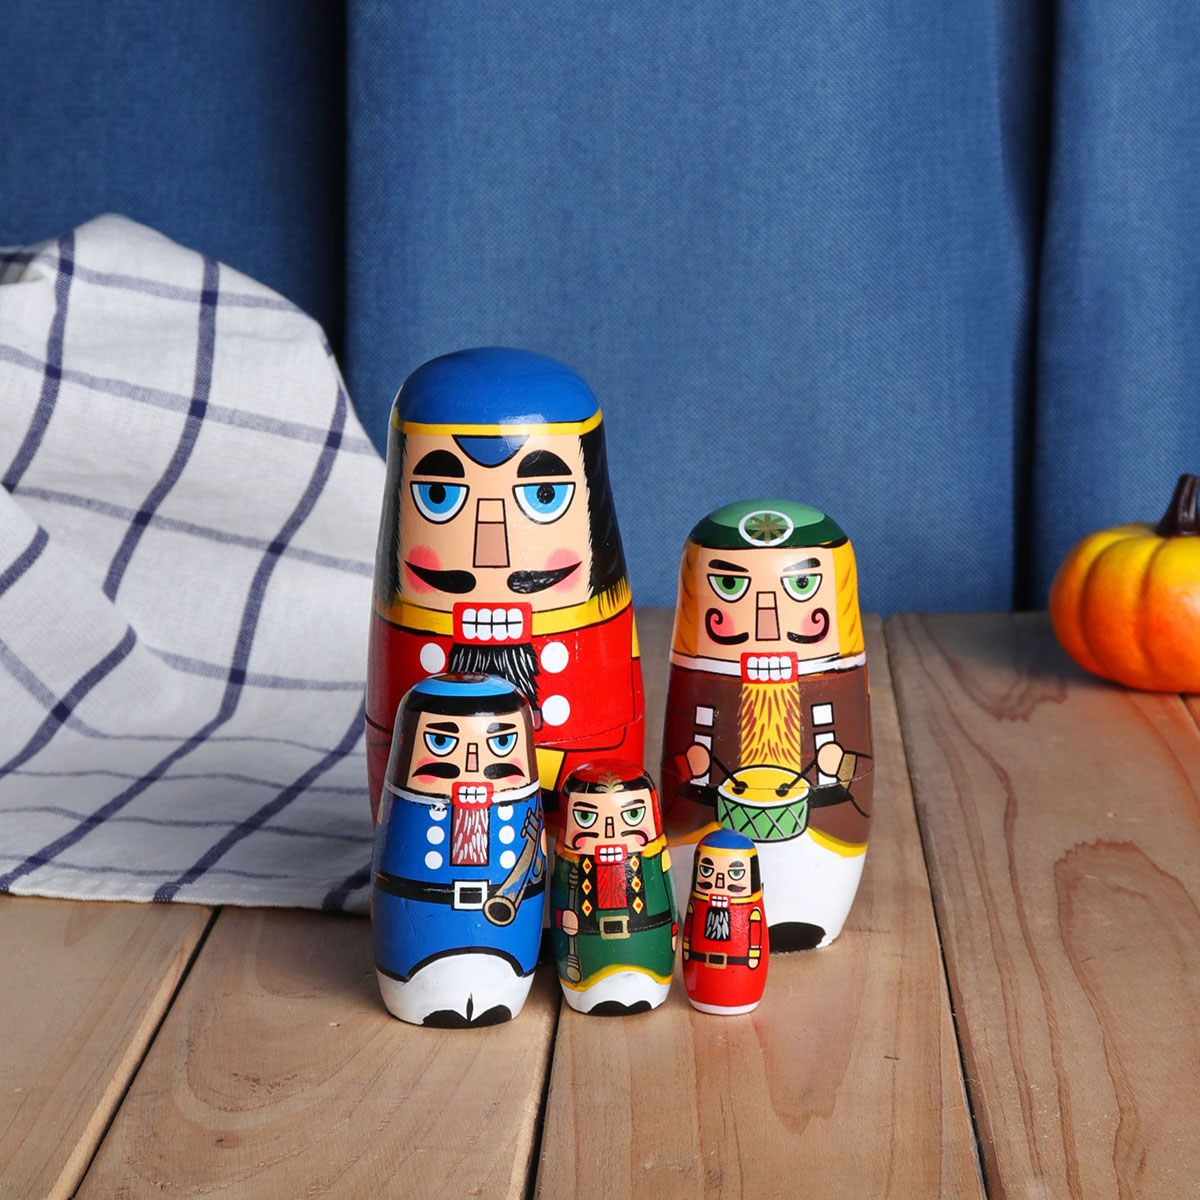 5pcs Wood Nutcracker Matryoshka Nesting Dolls Wooden Russian Doll